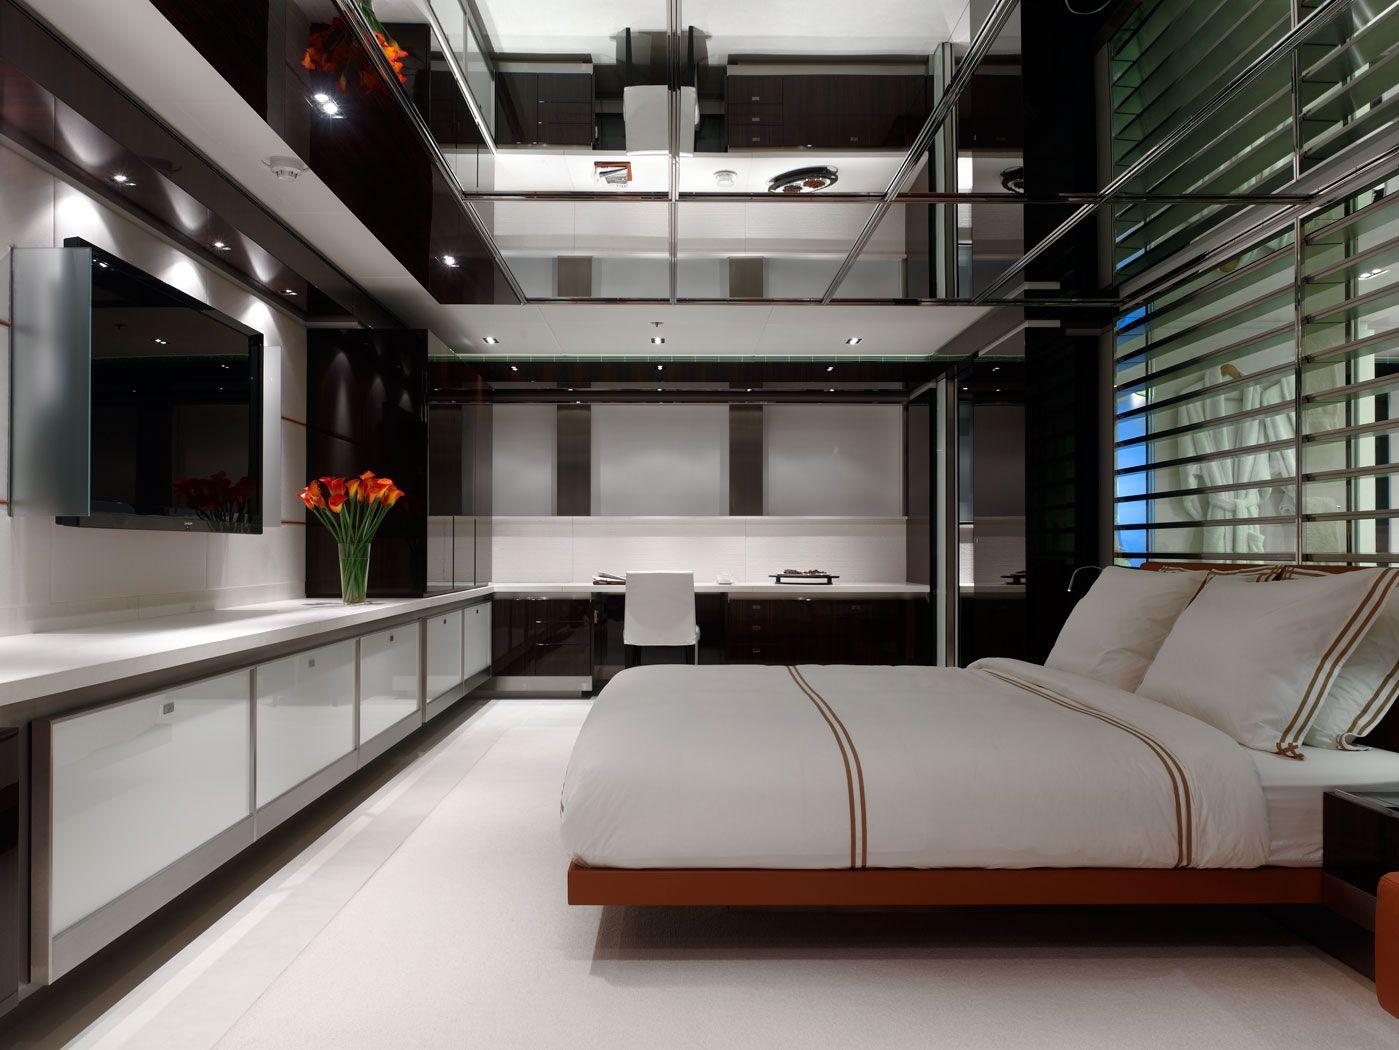 sky master stateroom - Masterschlafzimmerdesignplne